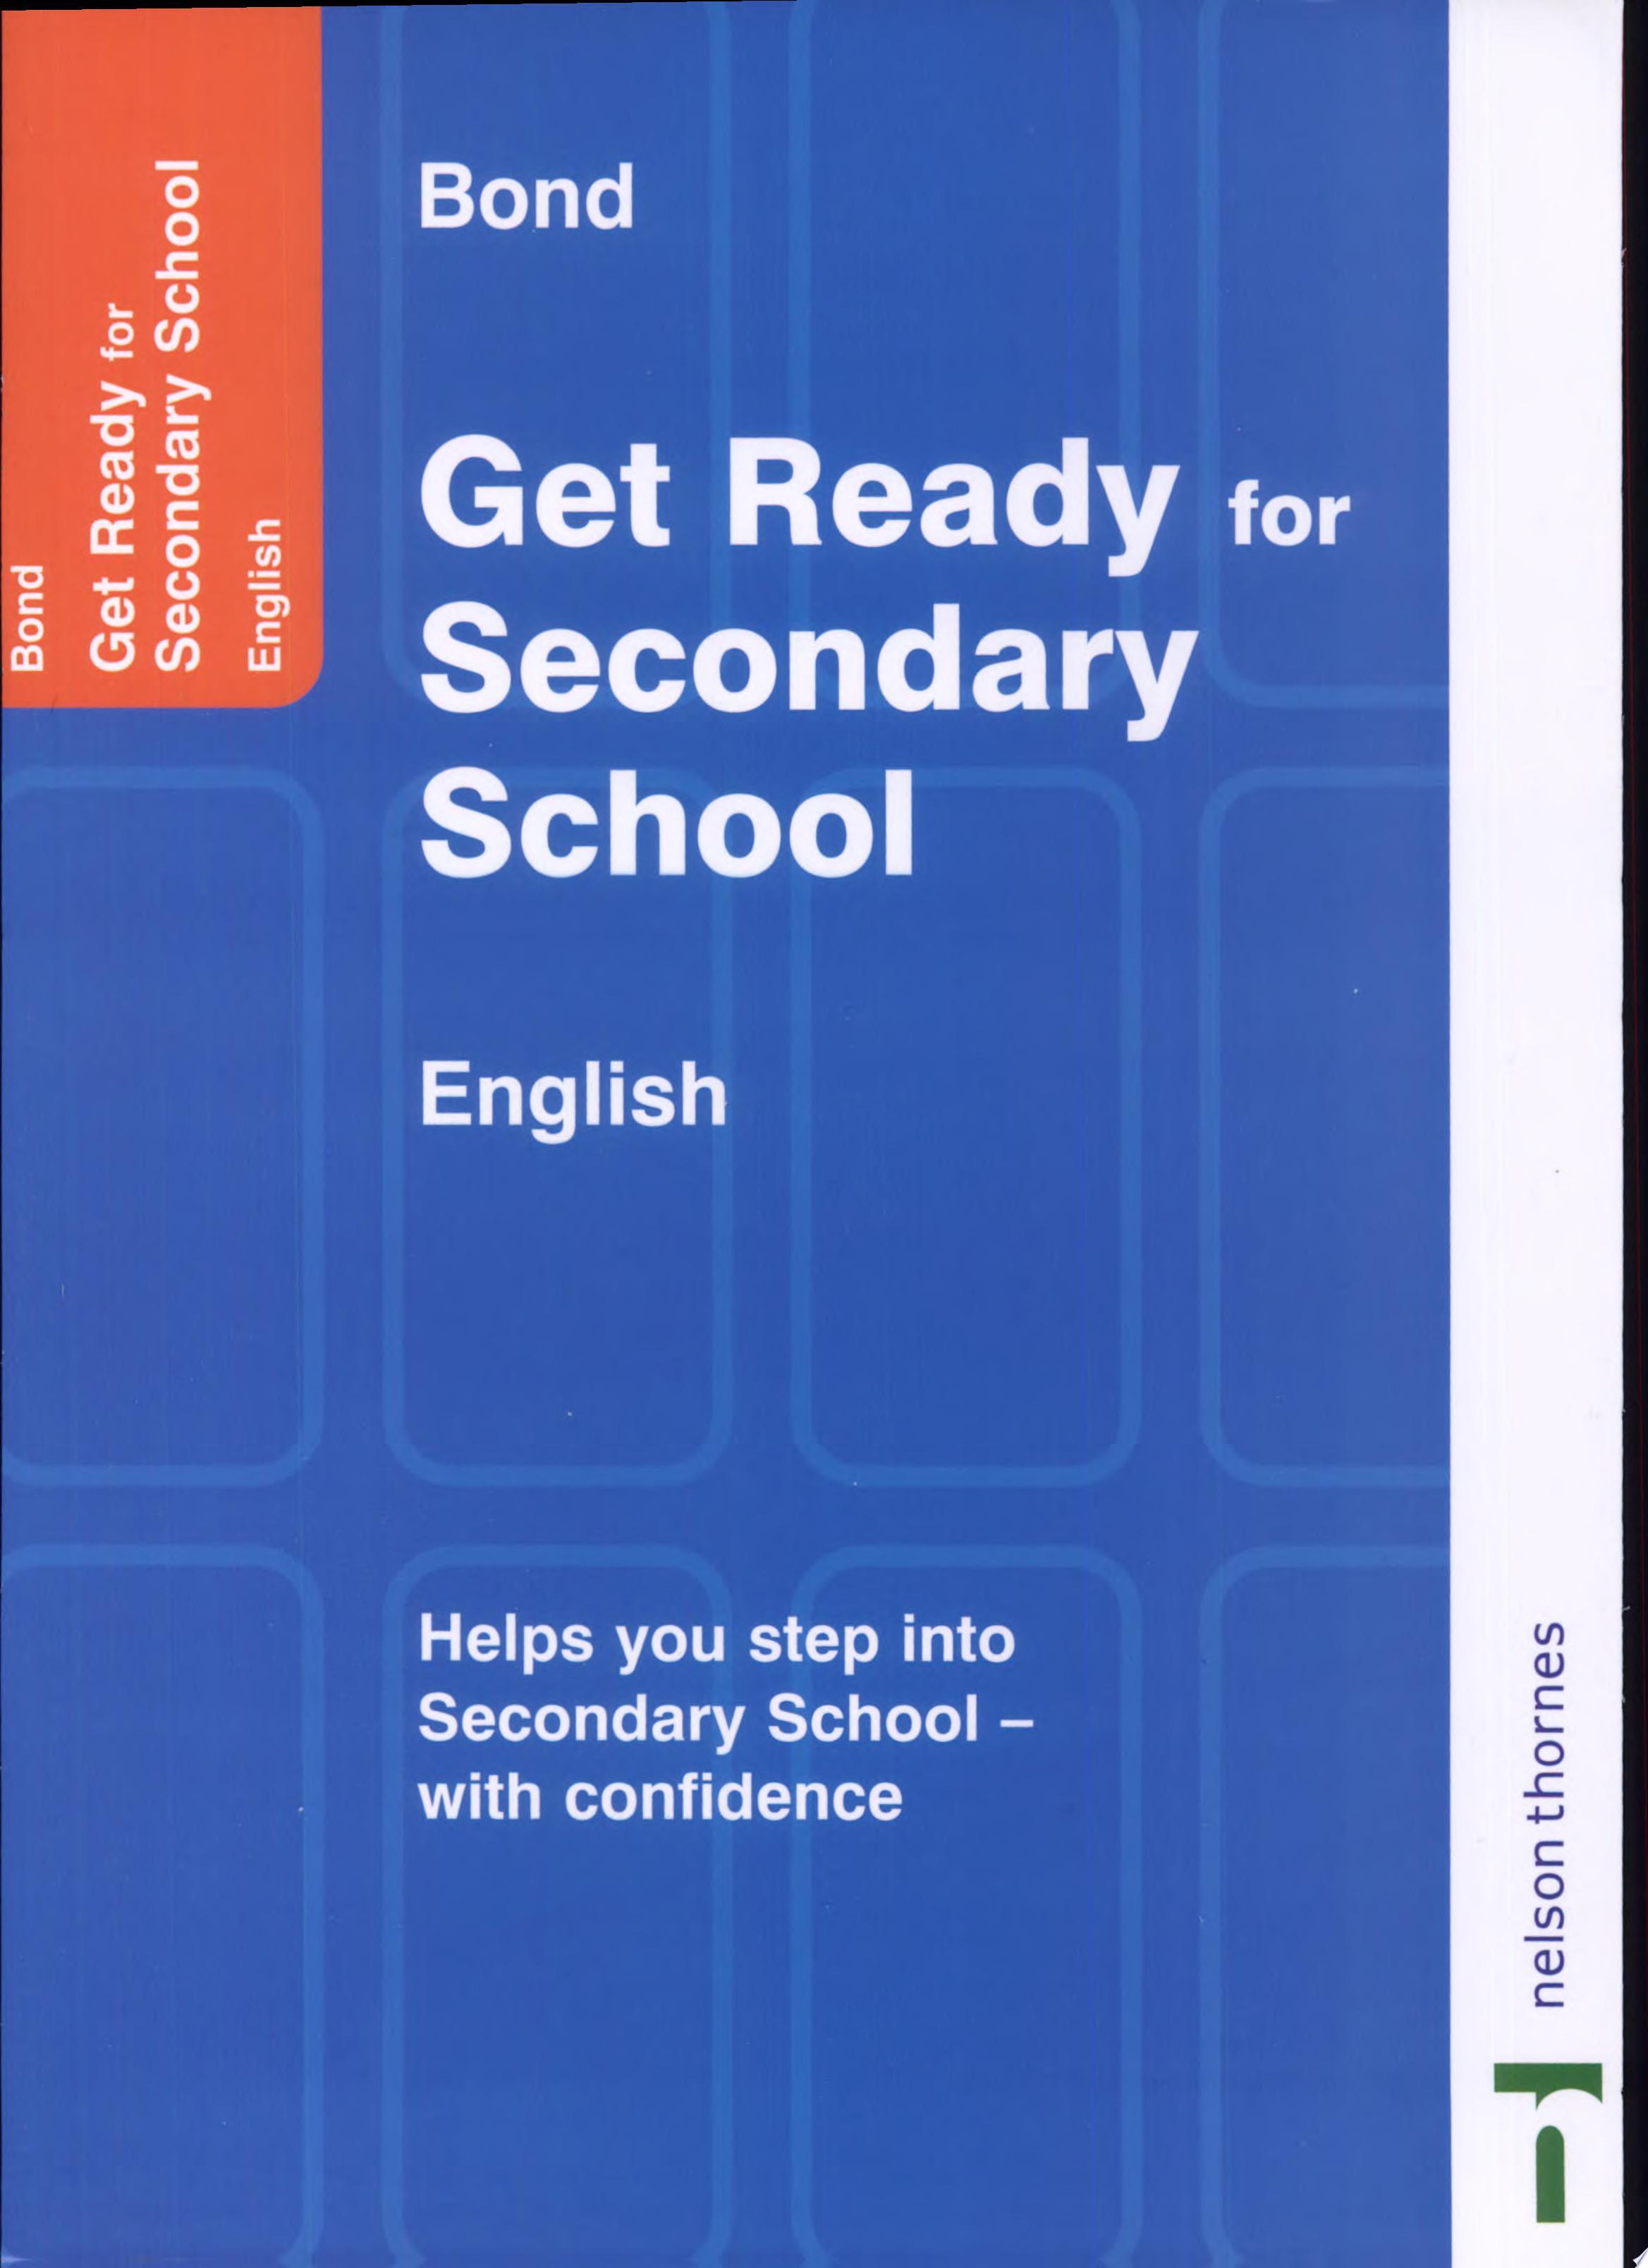 Bond Get Ready for Secondary School